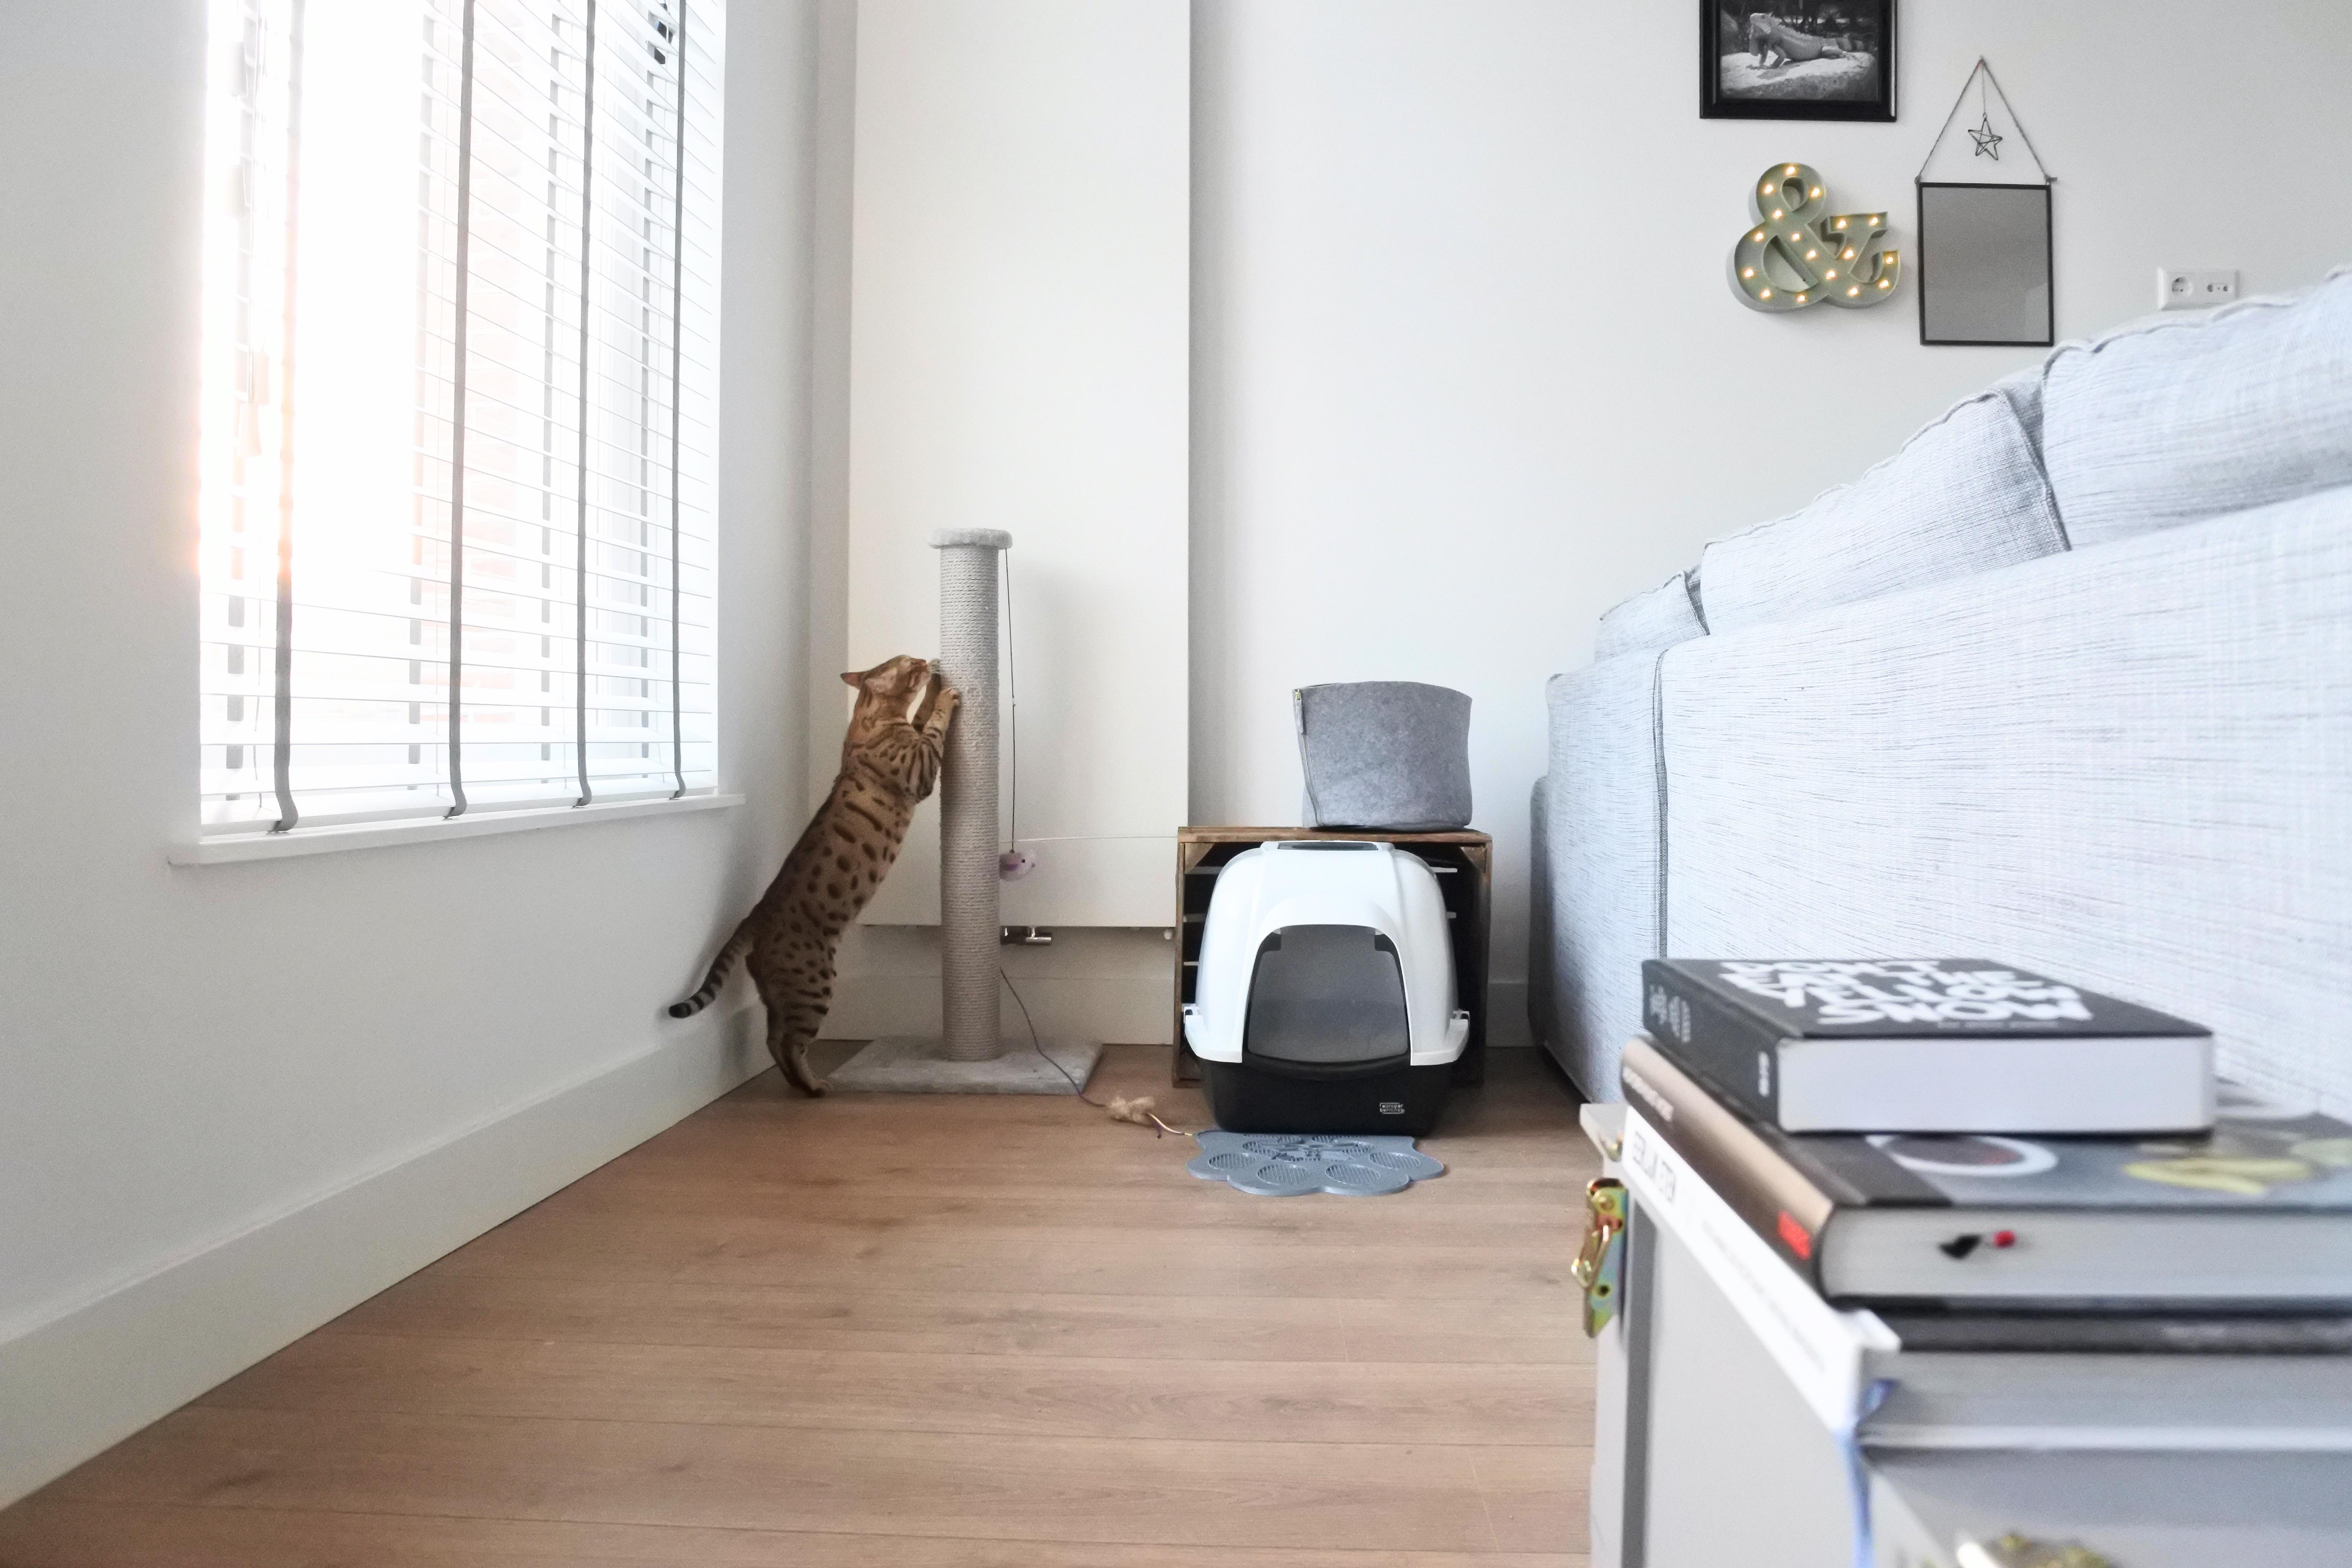 interior-design-hygge-styling-amsterdam-cat-corner